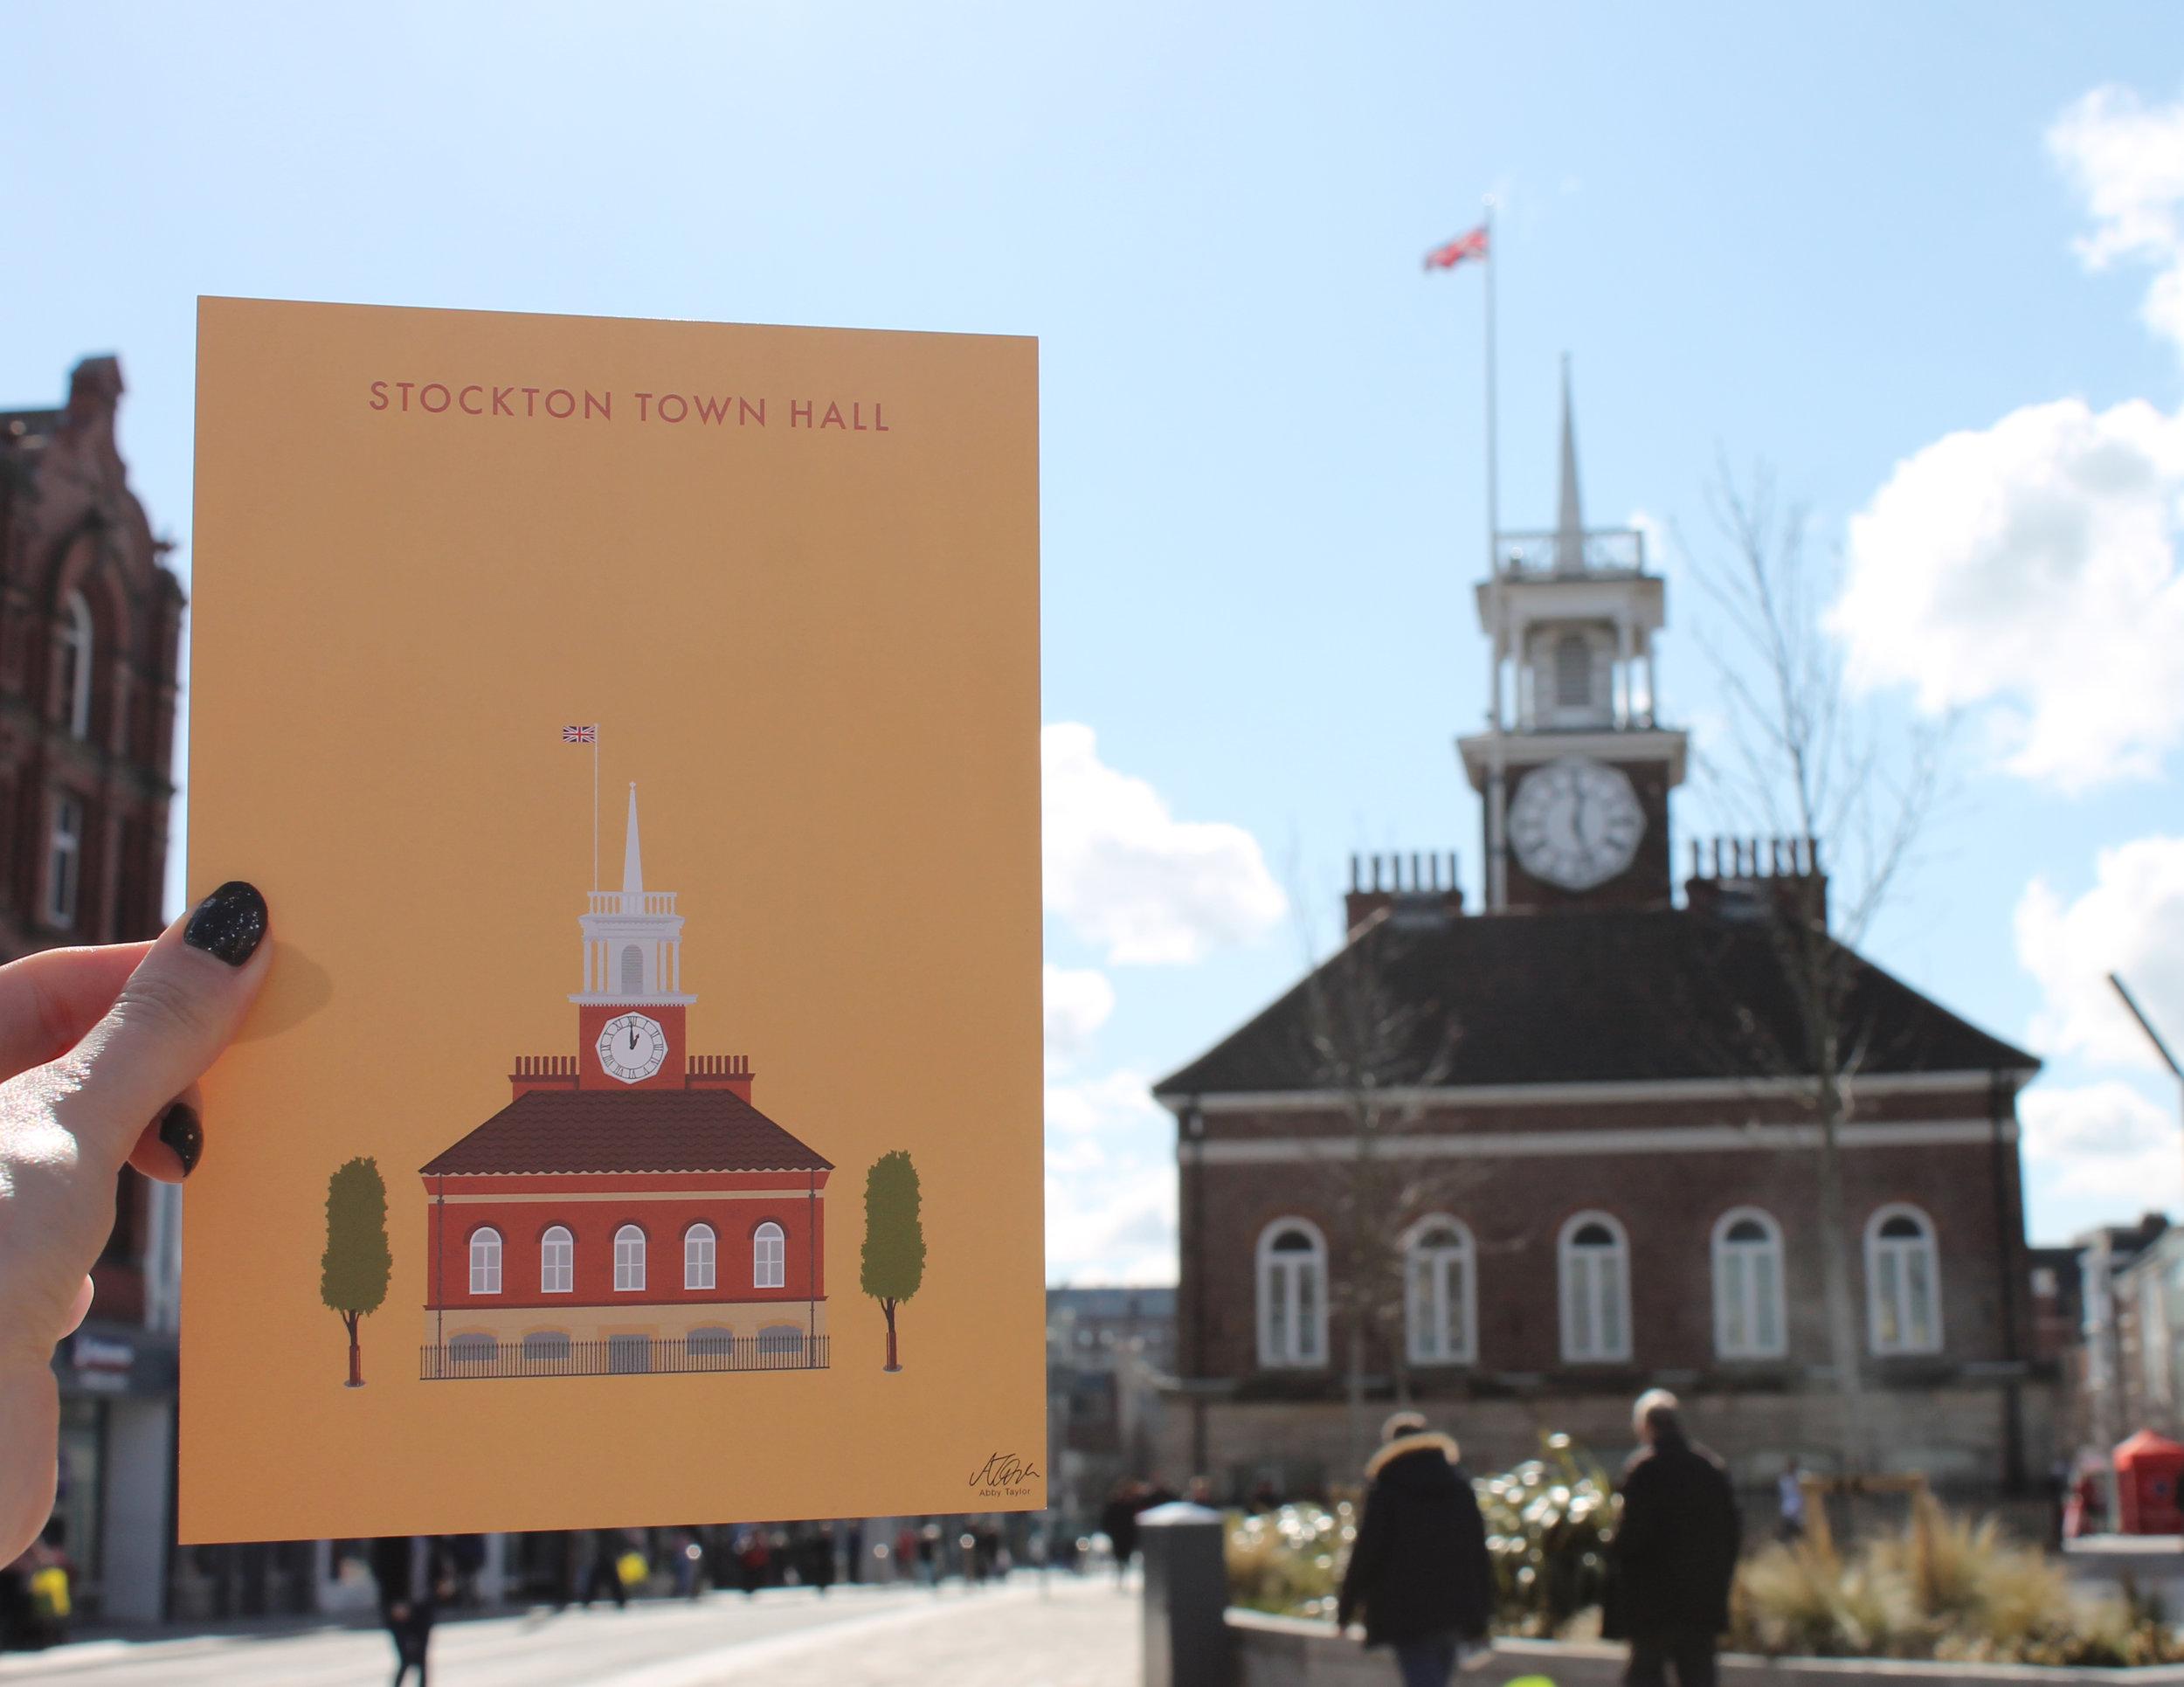 stockton town hall in situ.jpg